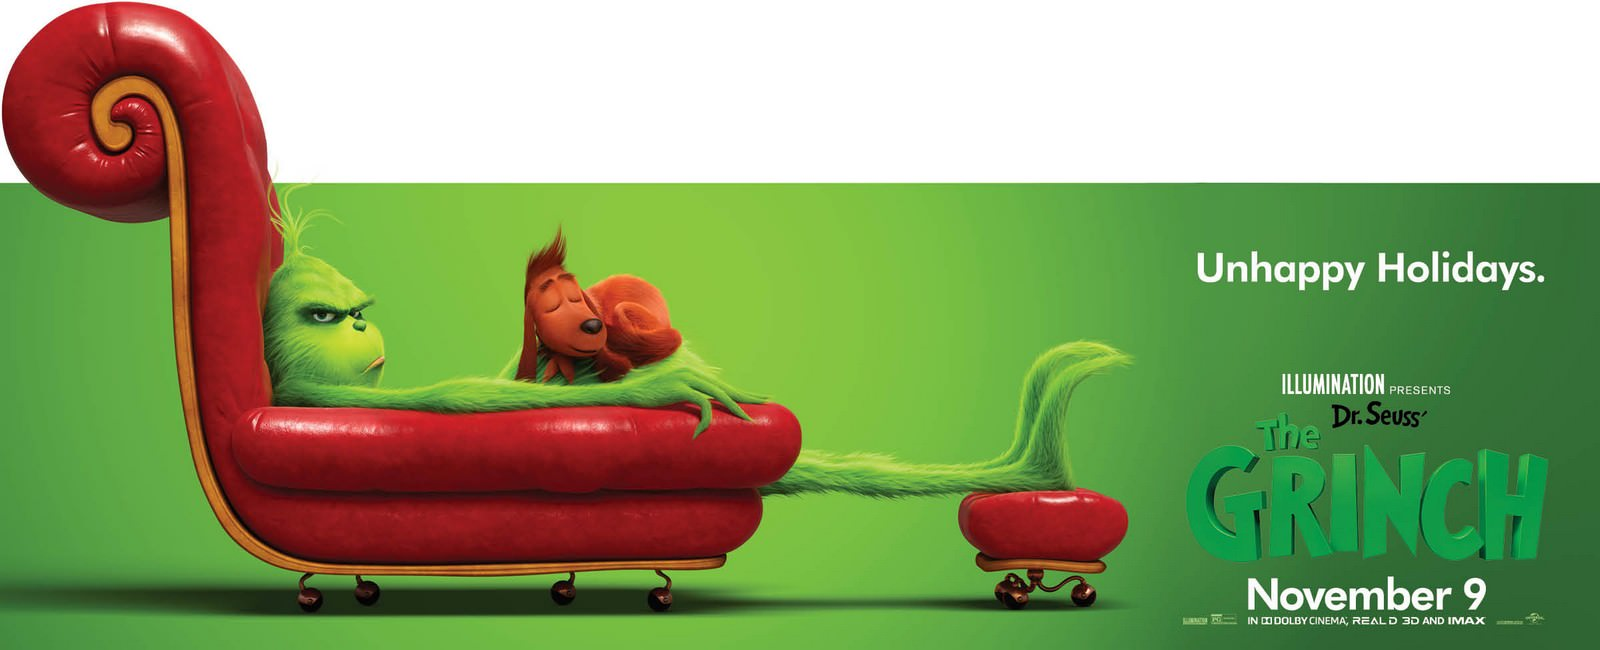 Movie, The Grinch(美國, 2018年) / 鬼靈精(台灣) / 绿毛怪格林奇(中國) / 聖誕怪怪傑(香港), 電影海報, 美國, 橫版